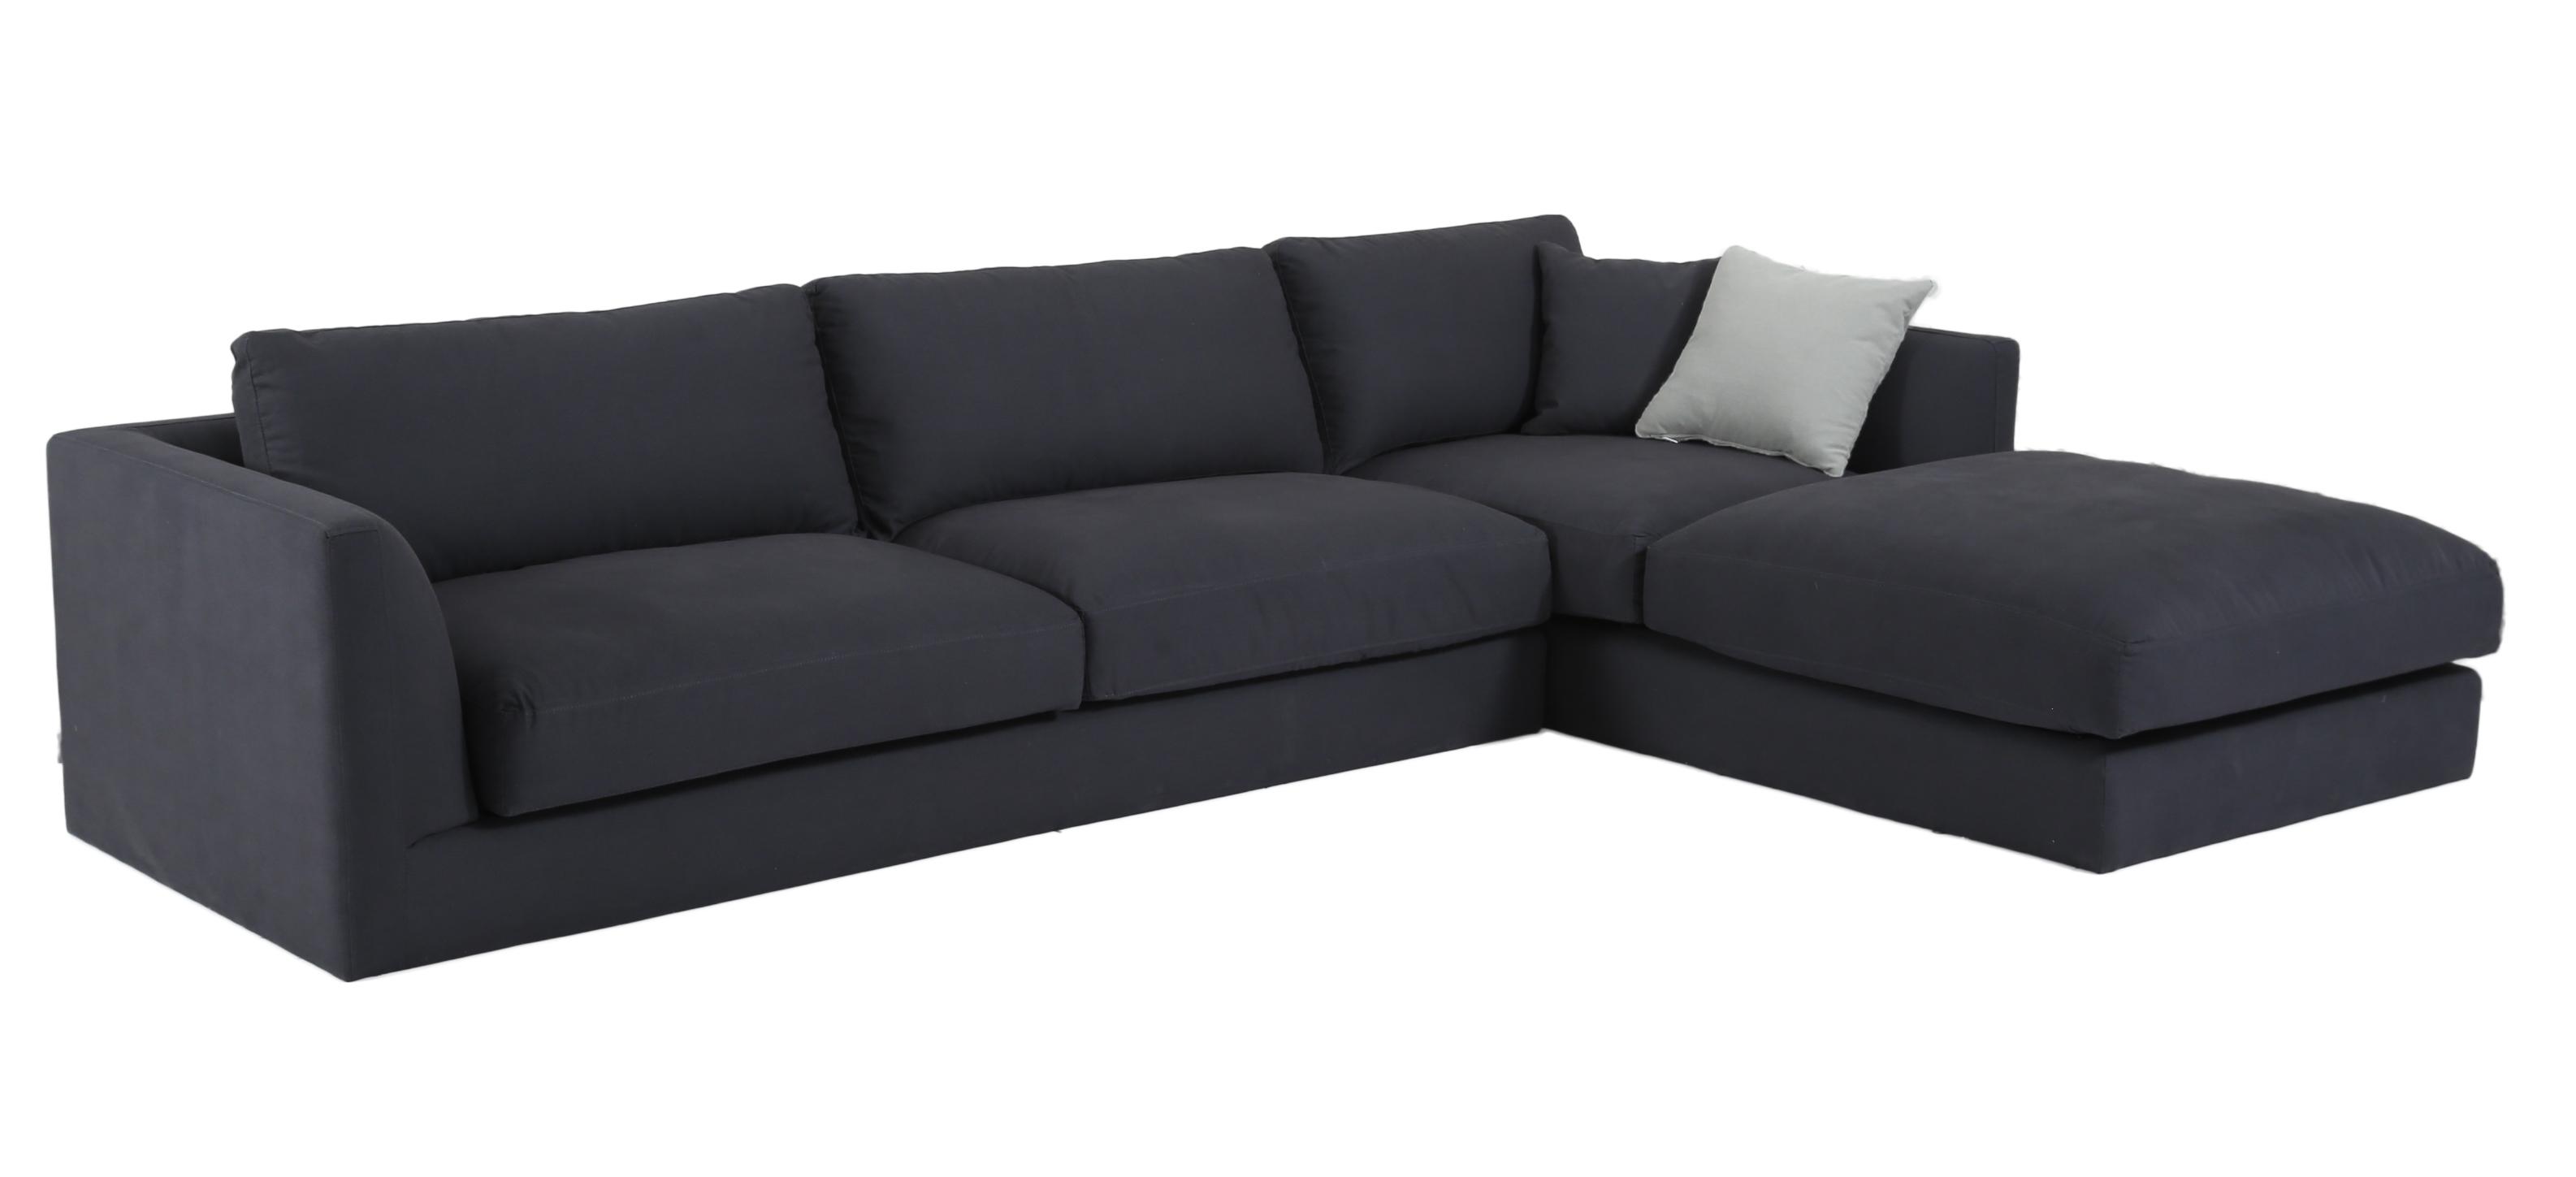 Fantastic 2018 New Large Right Or Left Modular Corner Sofa Dark Grey 3 4 Seater Sofa Made To Order Home Interior And Landscaping Mentranervesignezvosmurscom